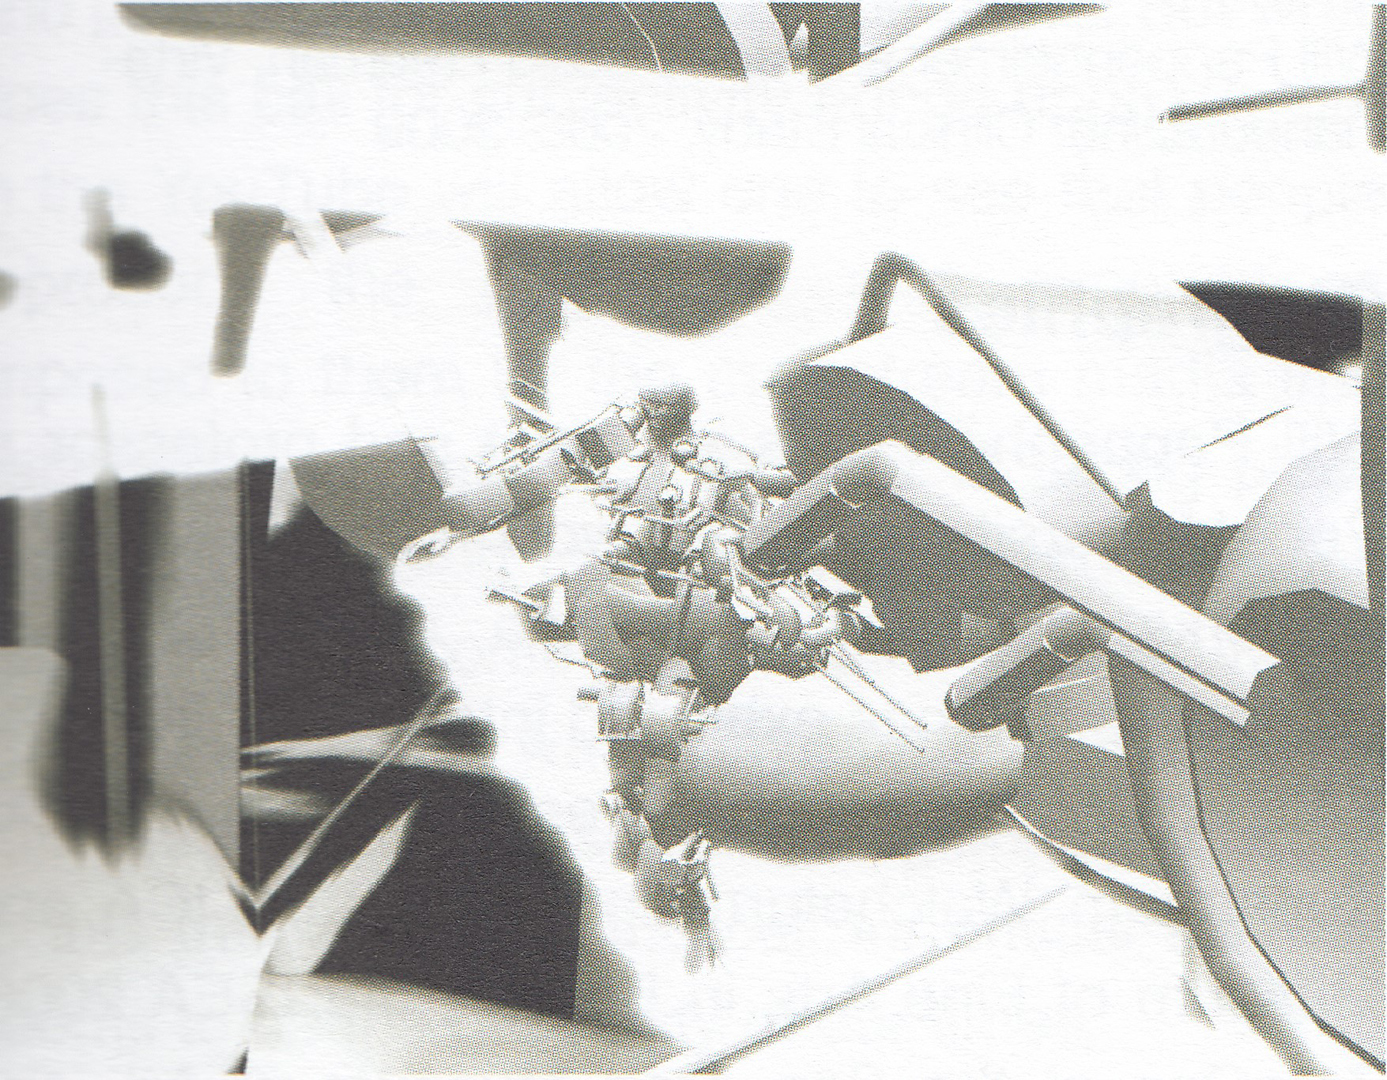 ©, Max Moswitzer, Whitenoise Morphosis: Semiautonomous Puppet Architectonics